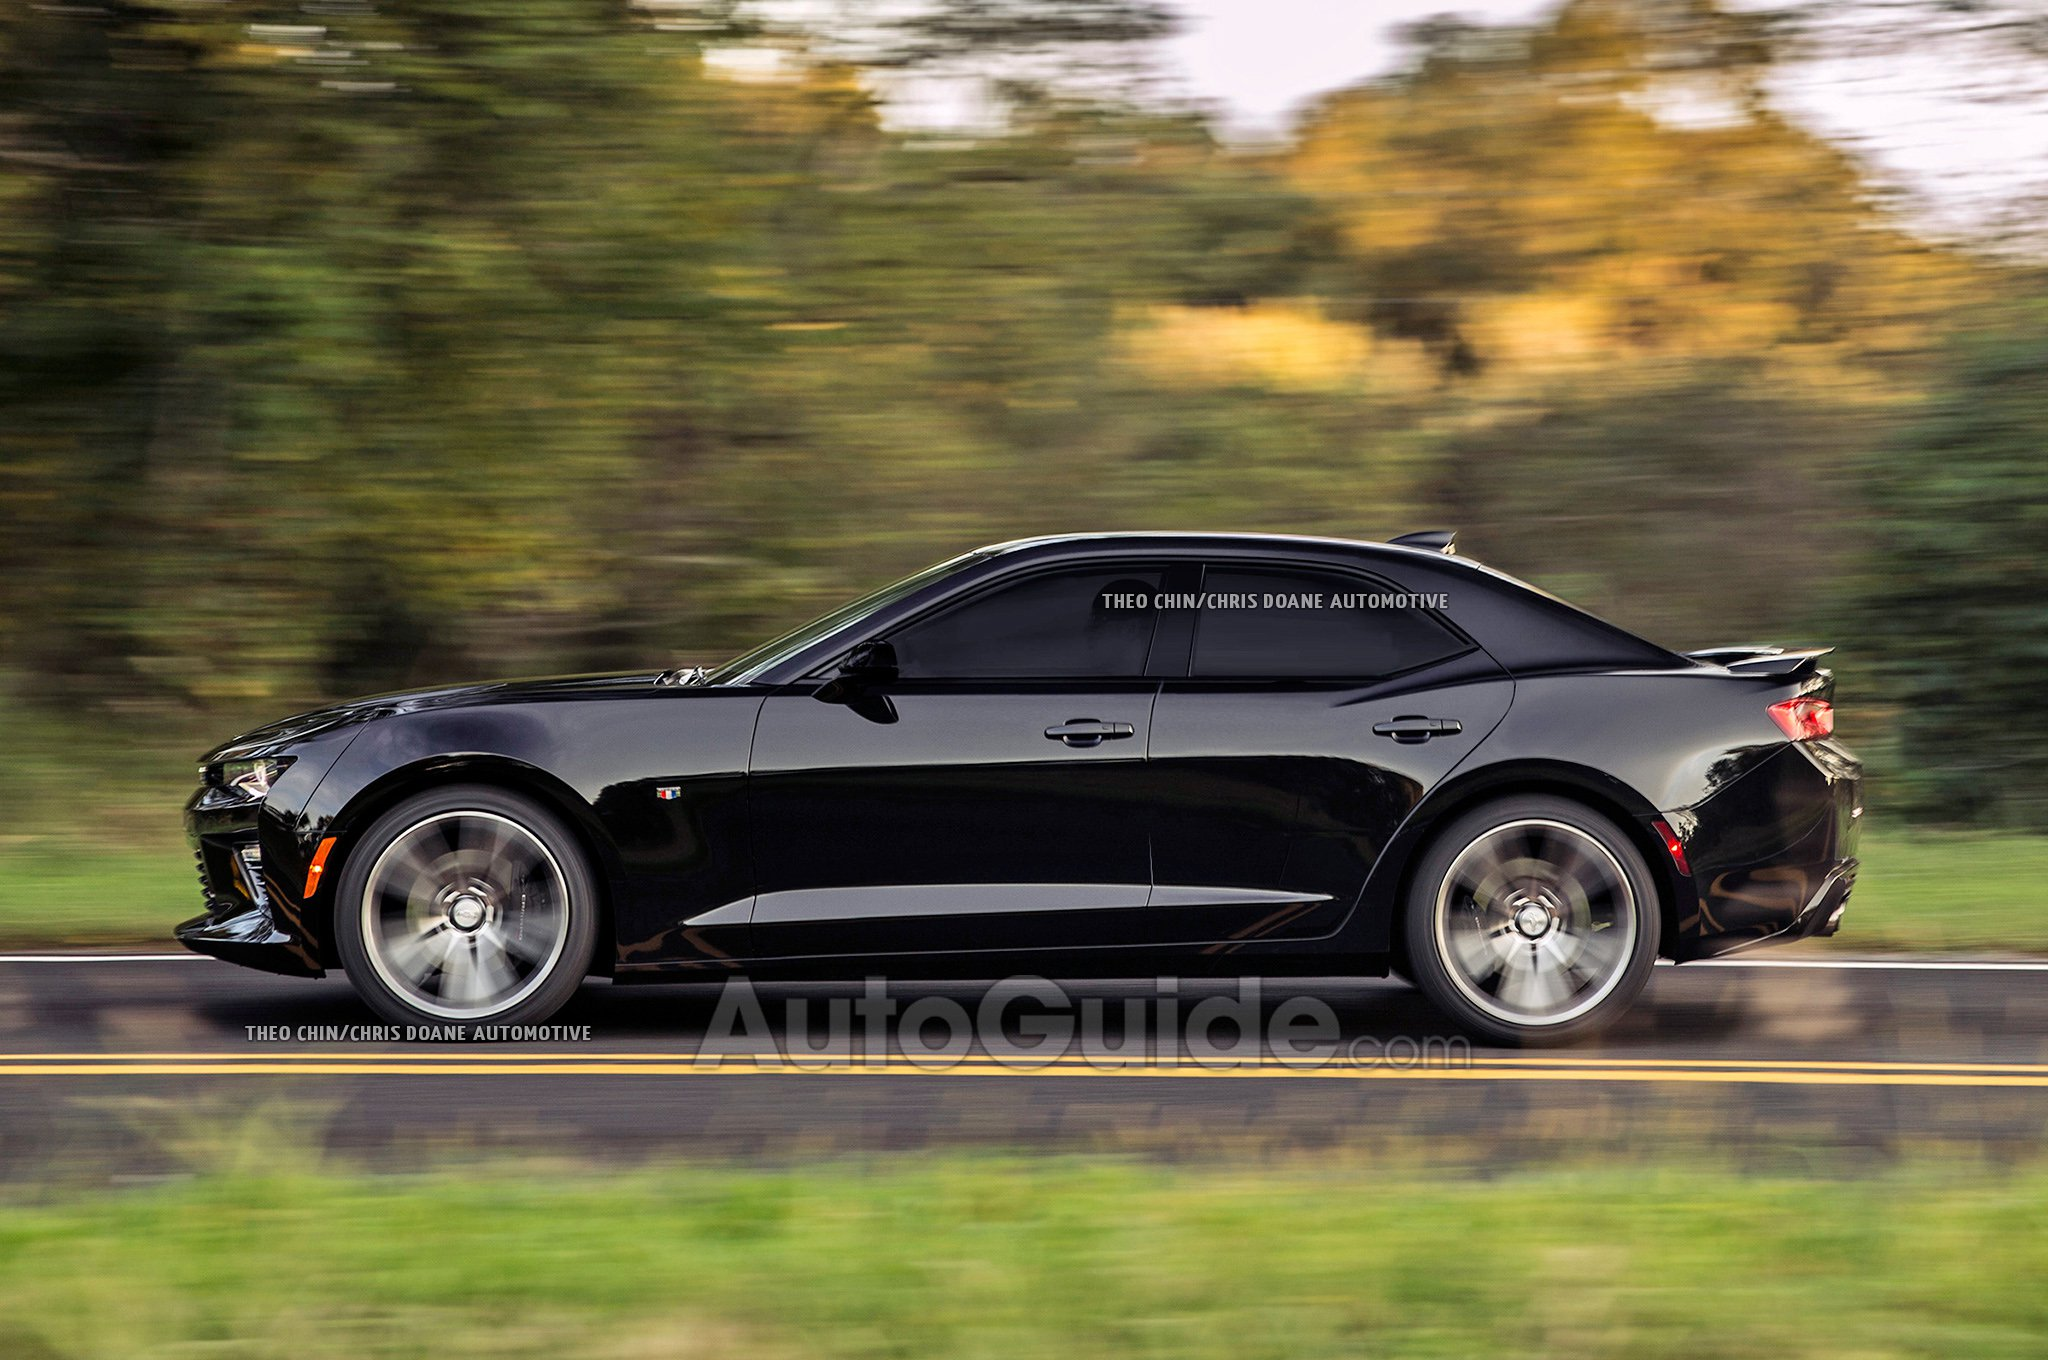 Camaro Ss Lease >> Camaro Sedan Anyone? - GM Inside News